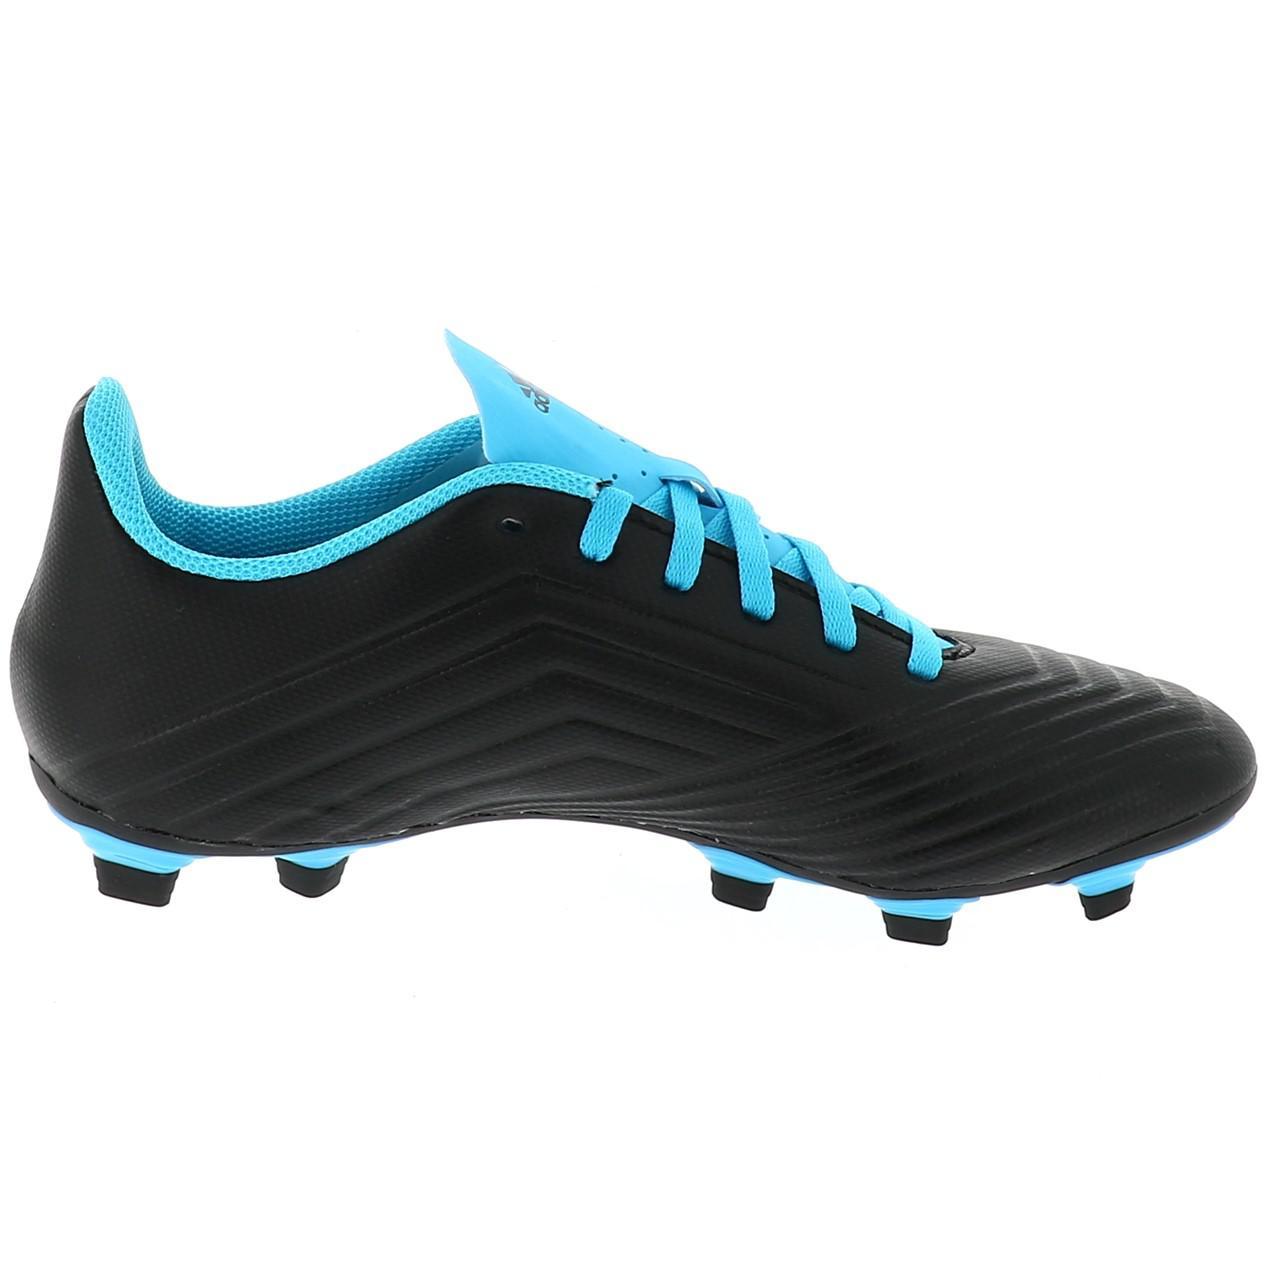 Chaussures-football-lamelles-Adidas-Predator-19-4-fg-grorg-Noir-42821-Neuf miniature 4